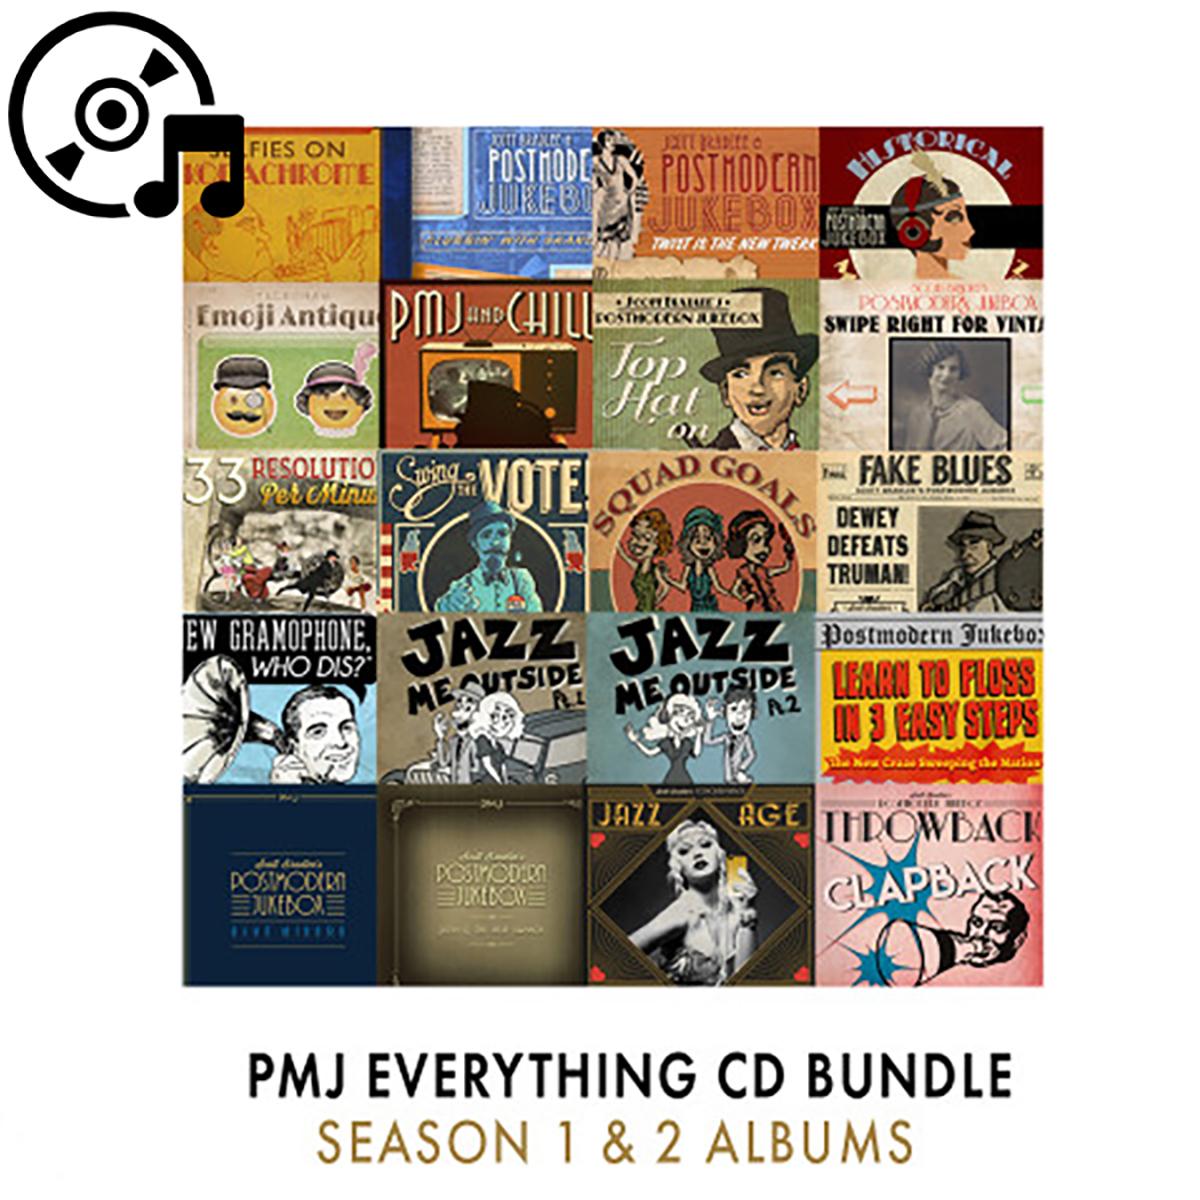 PMJ Everything CD bundle